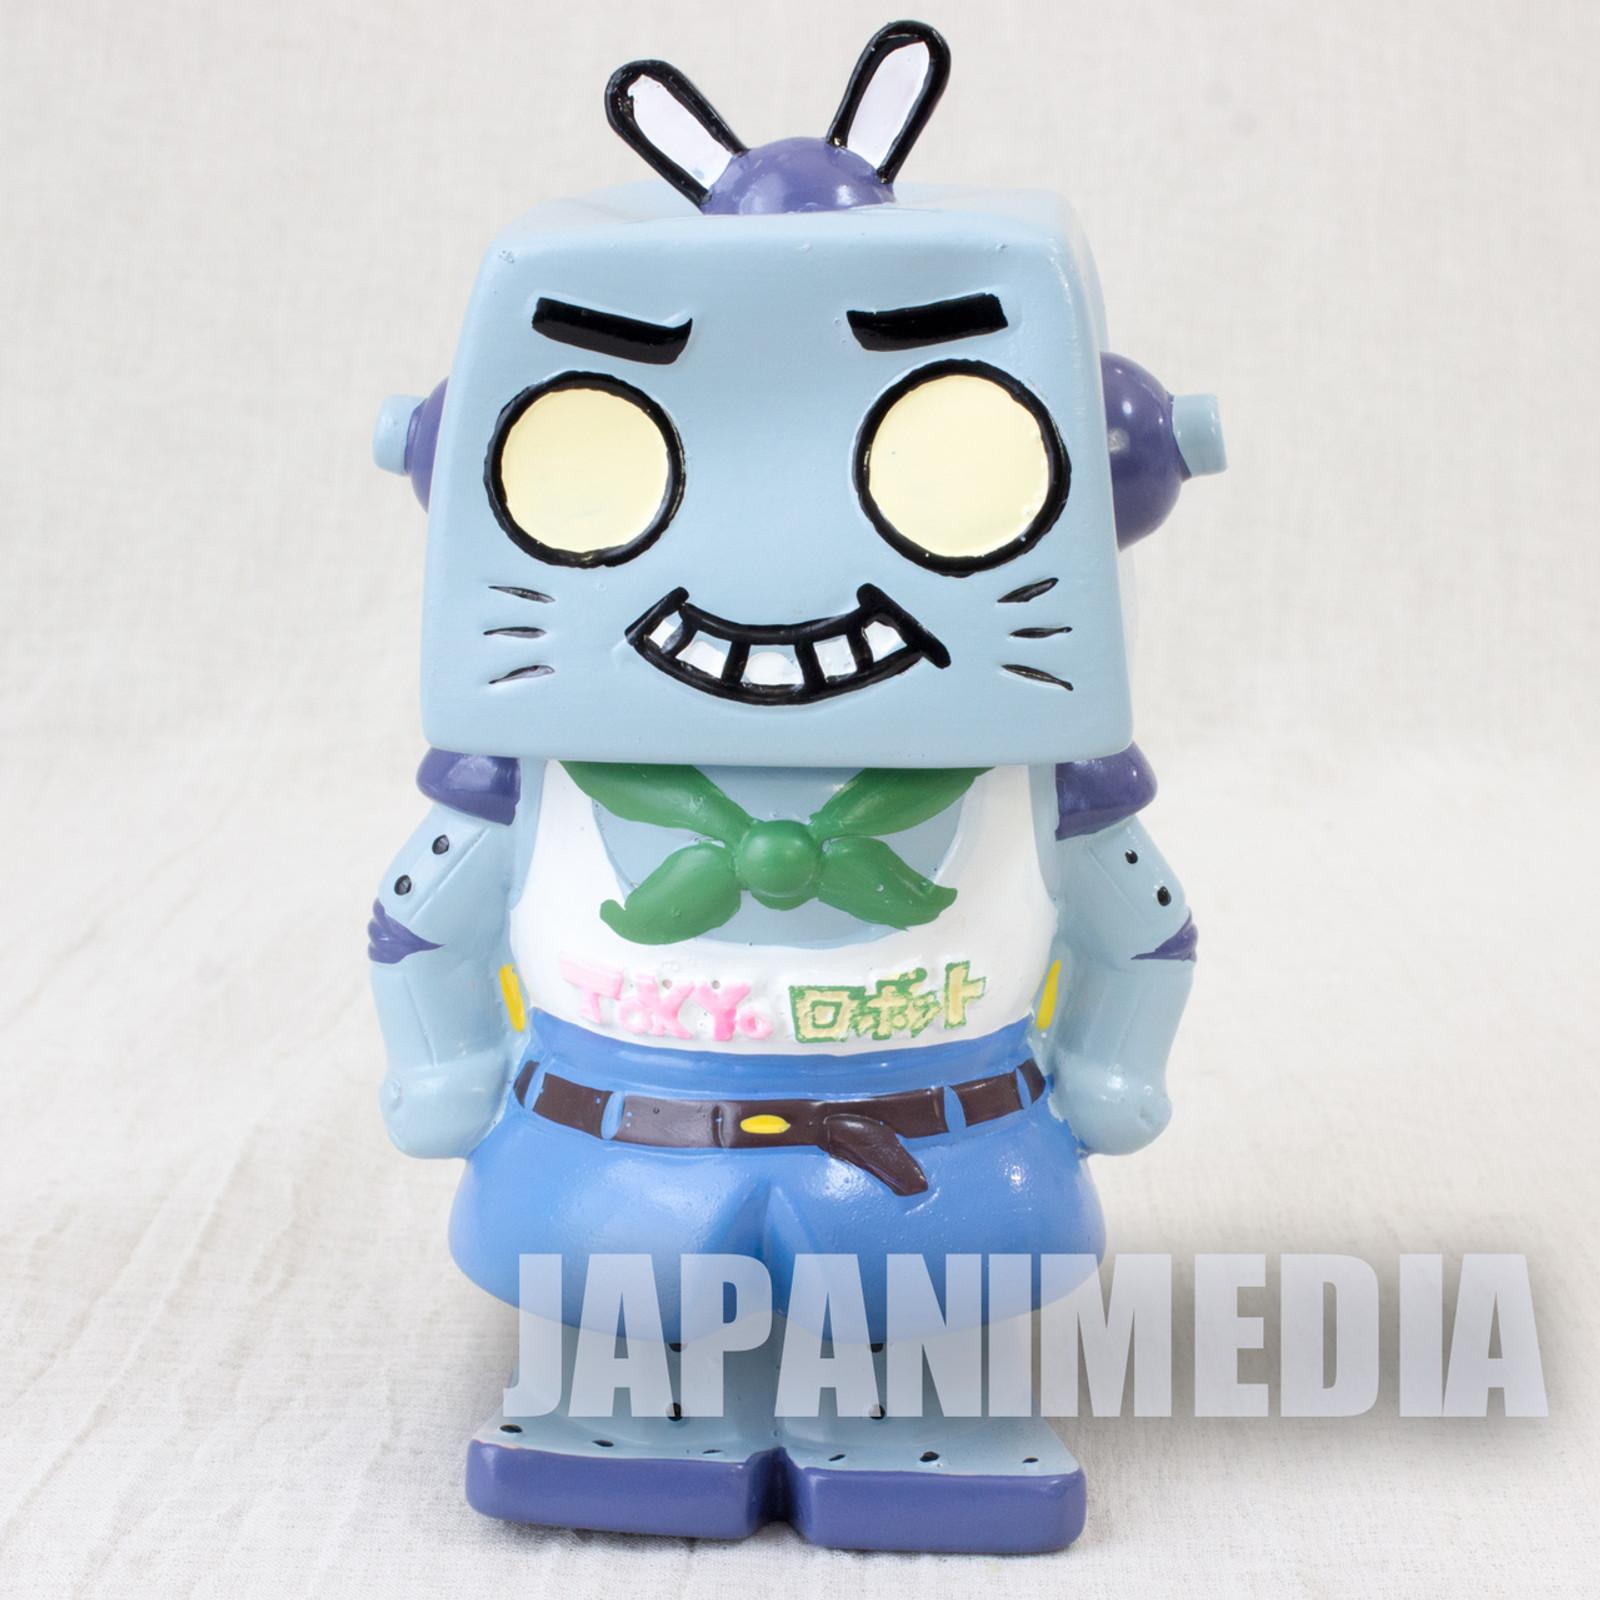 Retro RARE Boy Tokyo Robot 1st Anniverary Soft Vinyl Figure 1995